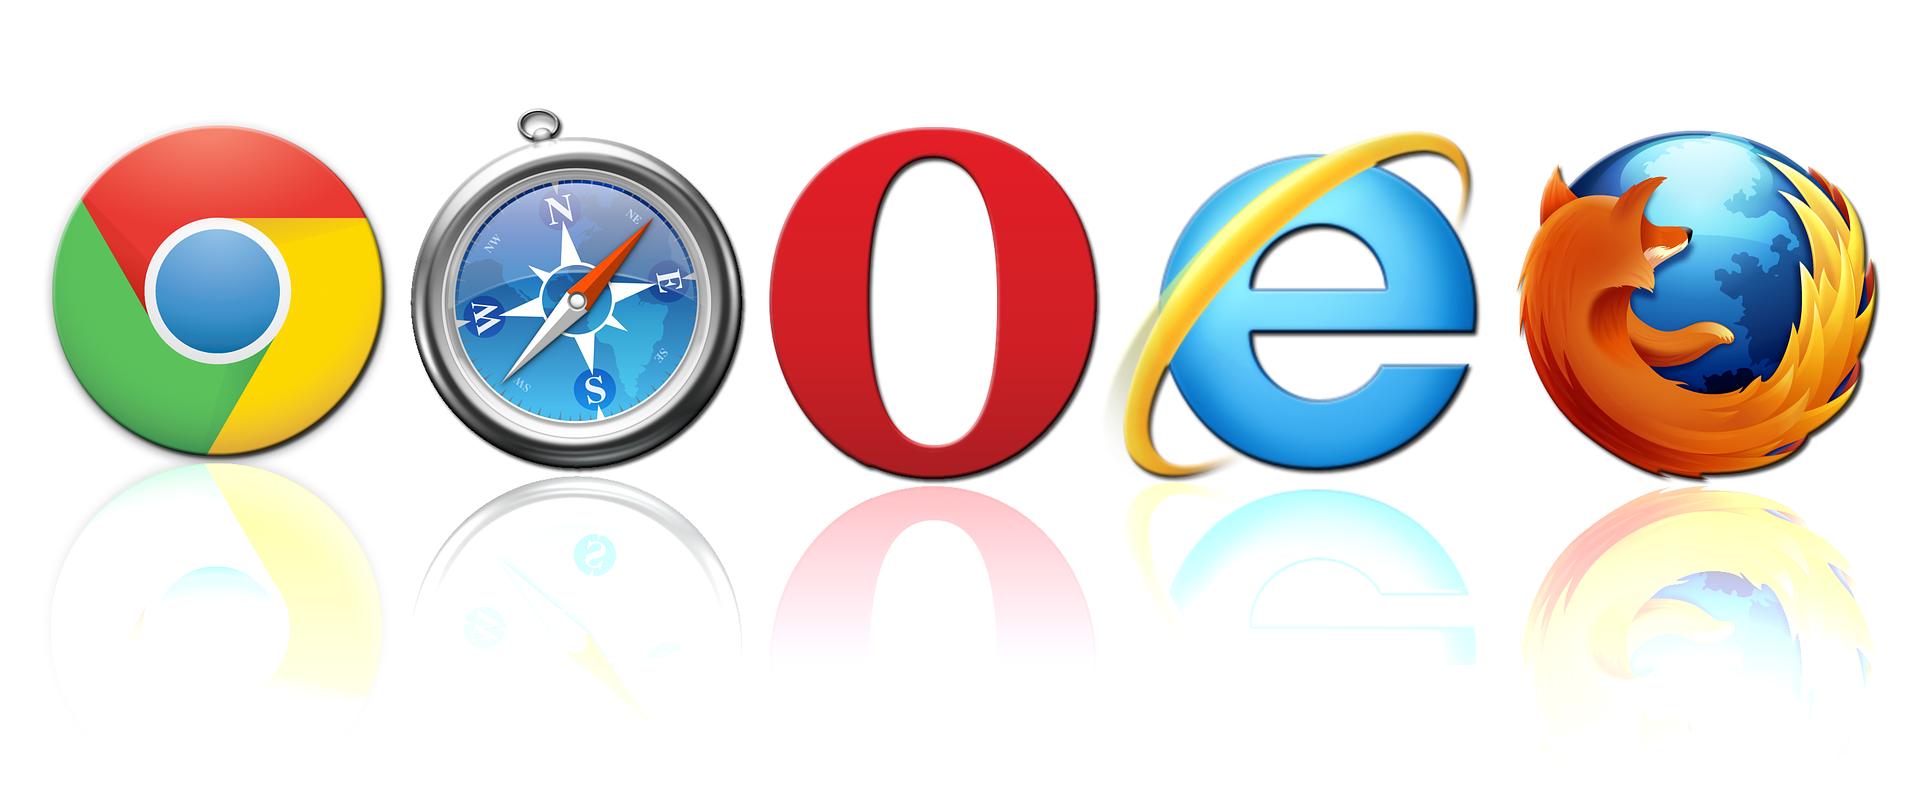 https://petljamediastorage.blob.core.windows.net/root/Media/Default/Kursevi/OnlineNastava/6_razred_IKT_DigitalnaPismenost/browsers.png